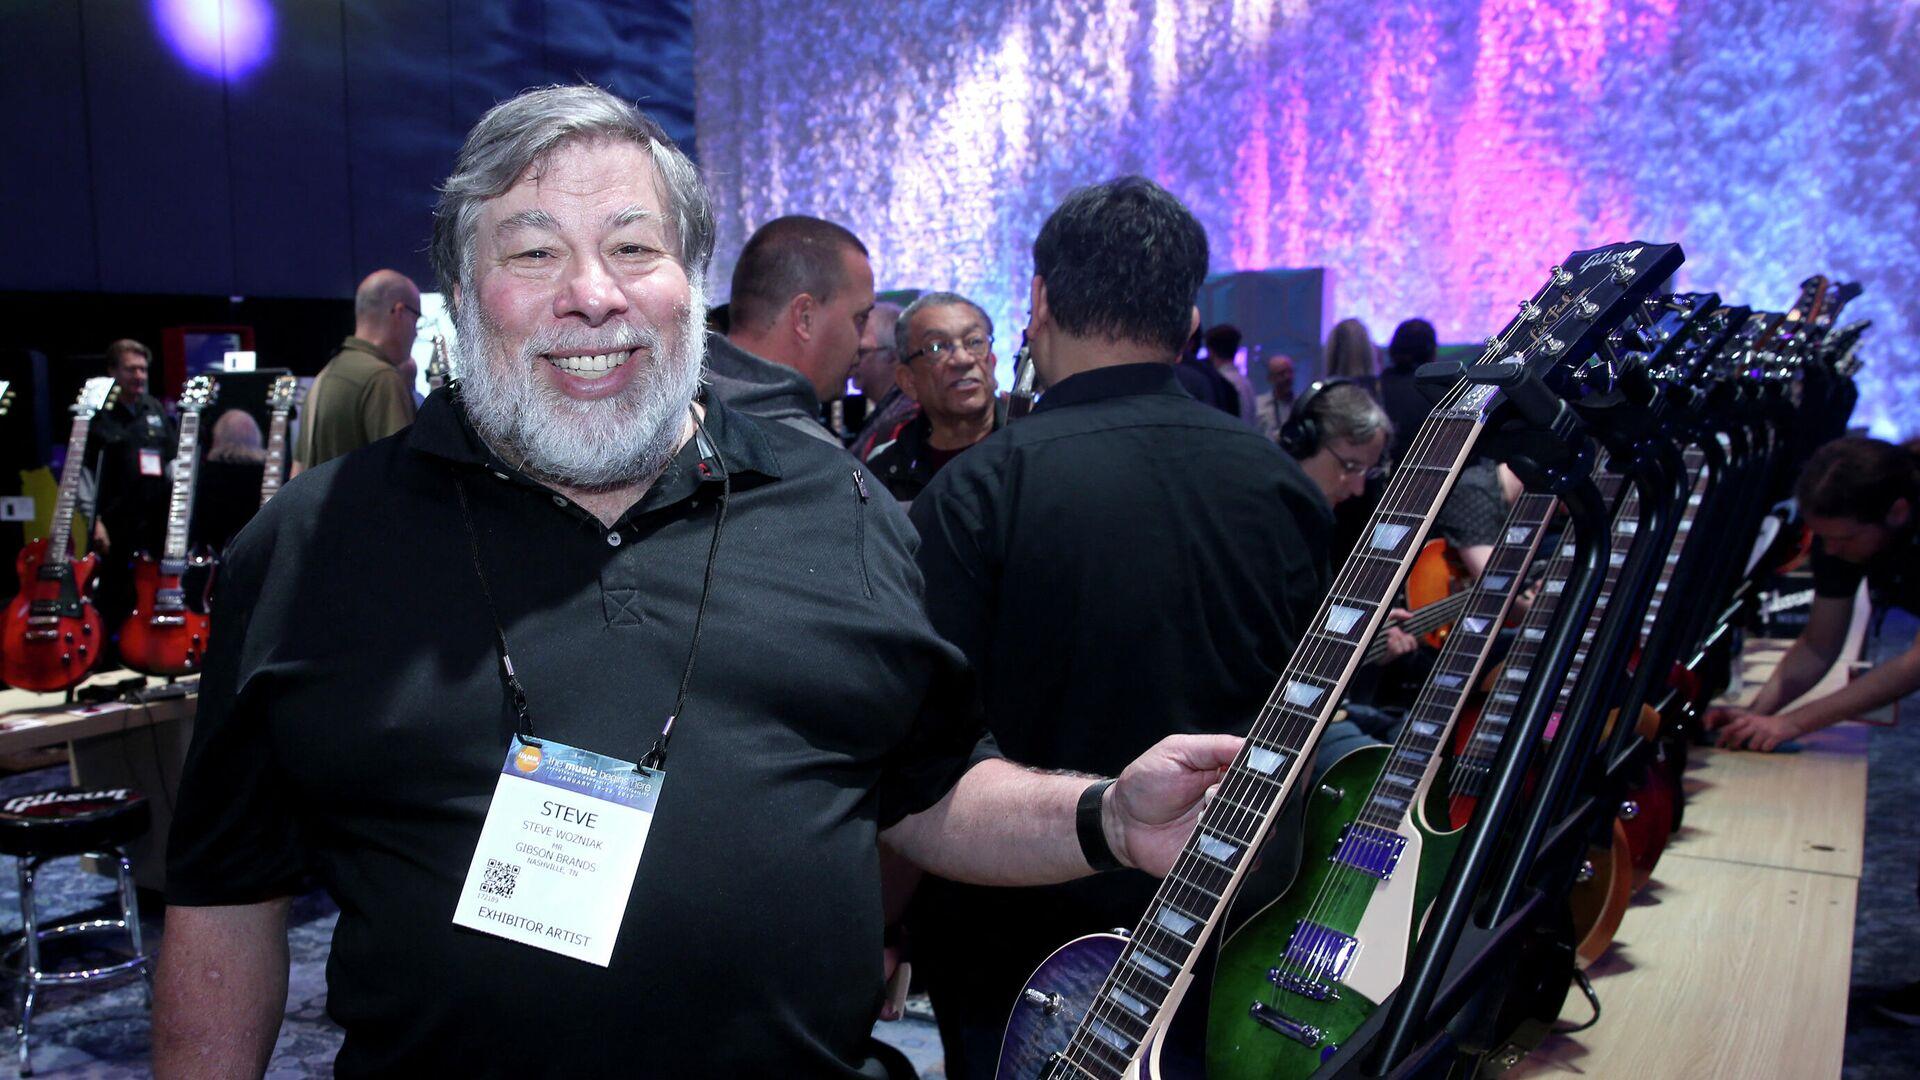 Steve Wozniak (2017) - SNA, 1920, 14.09.2021